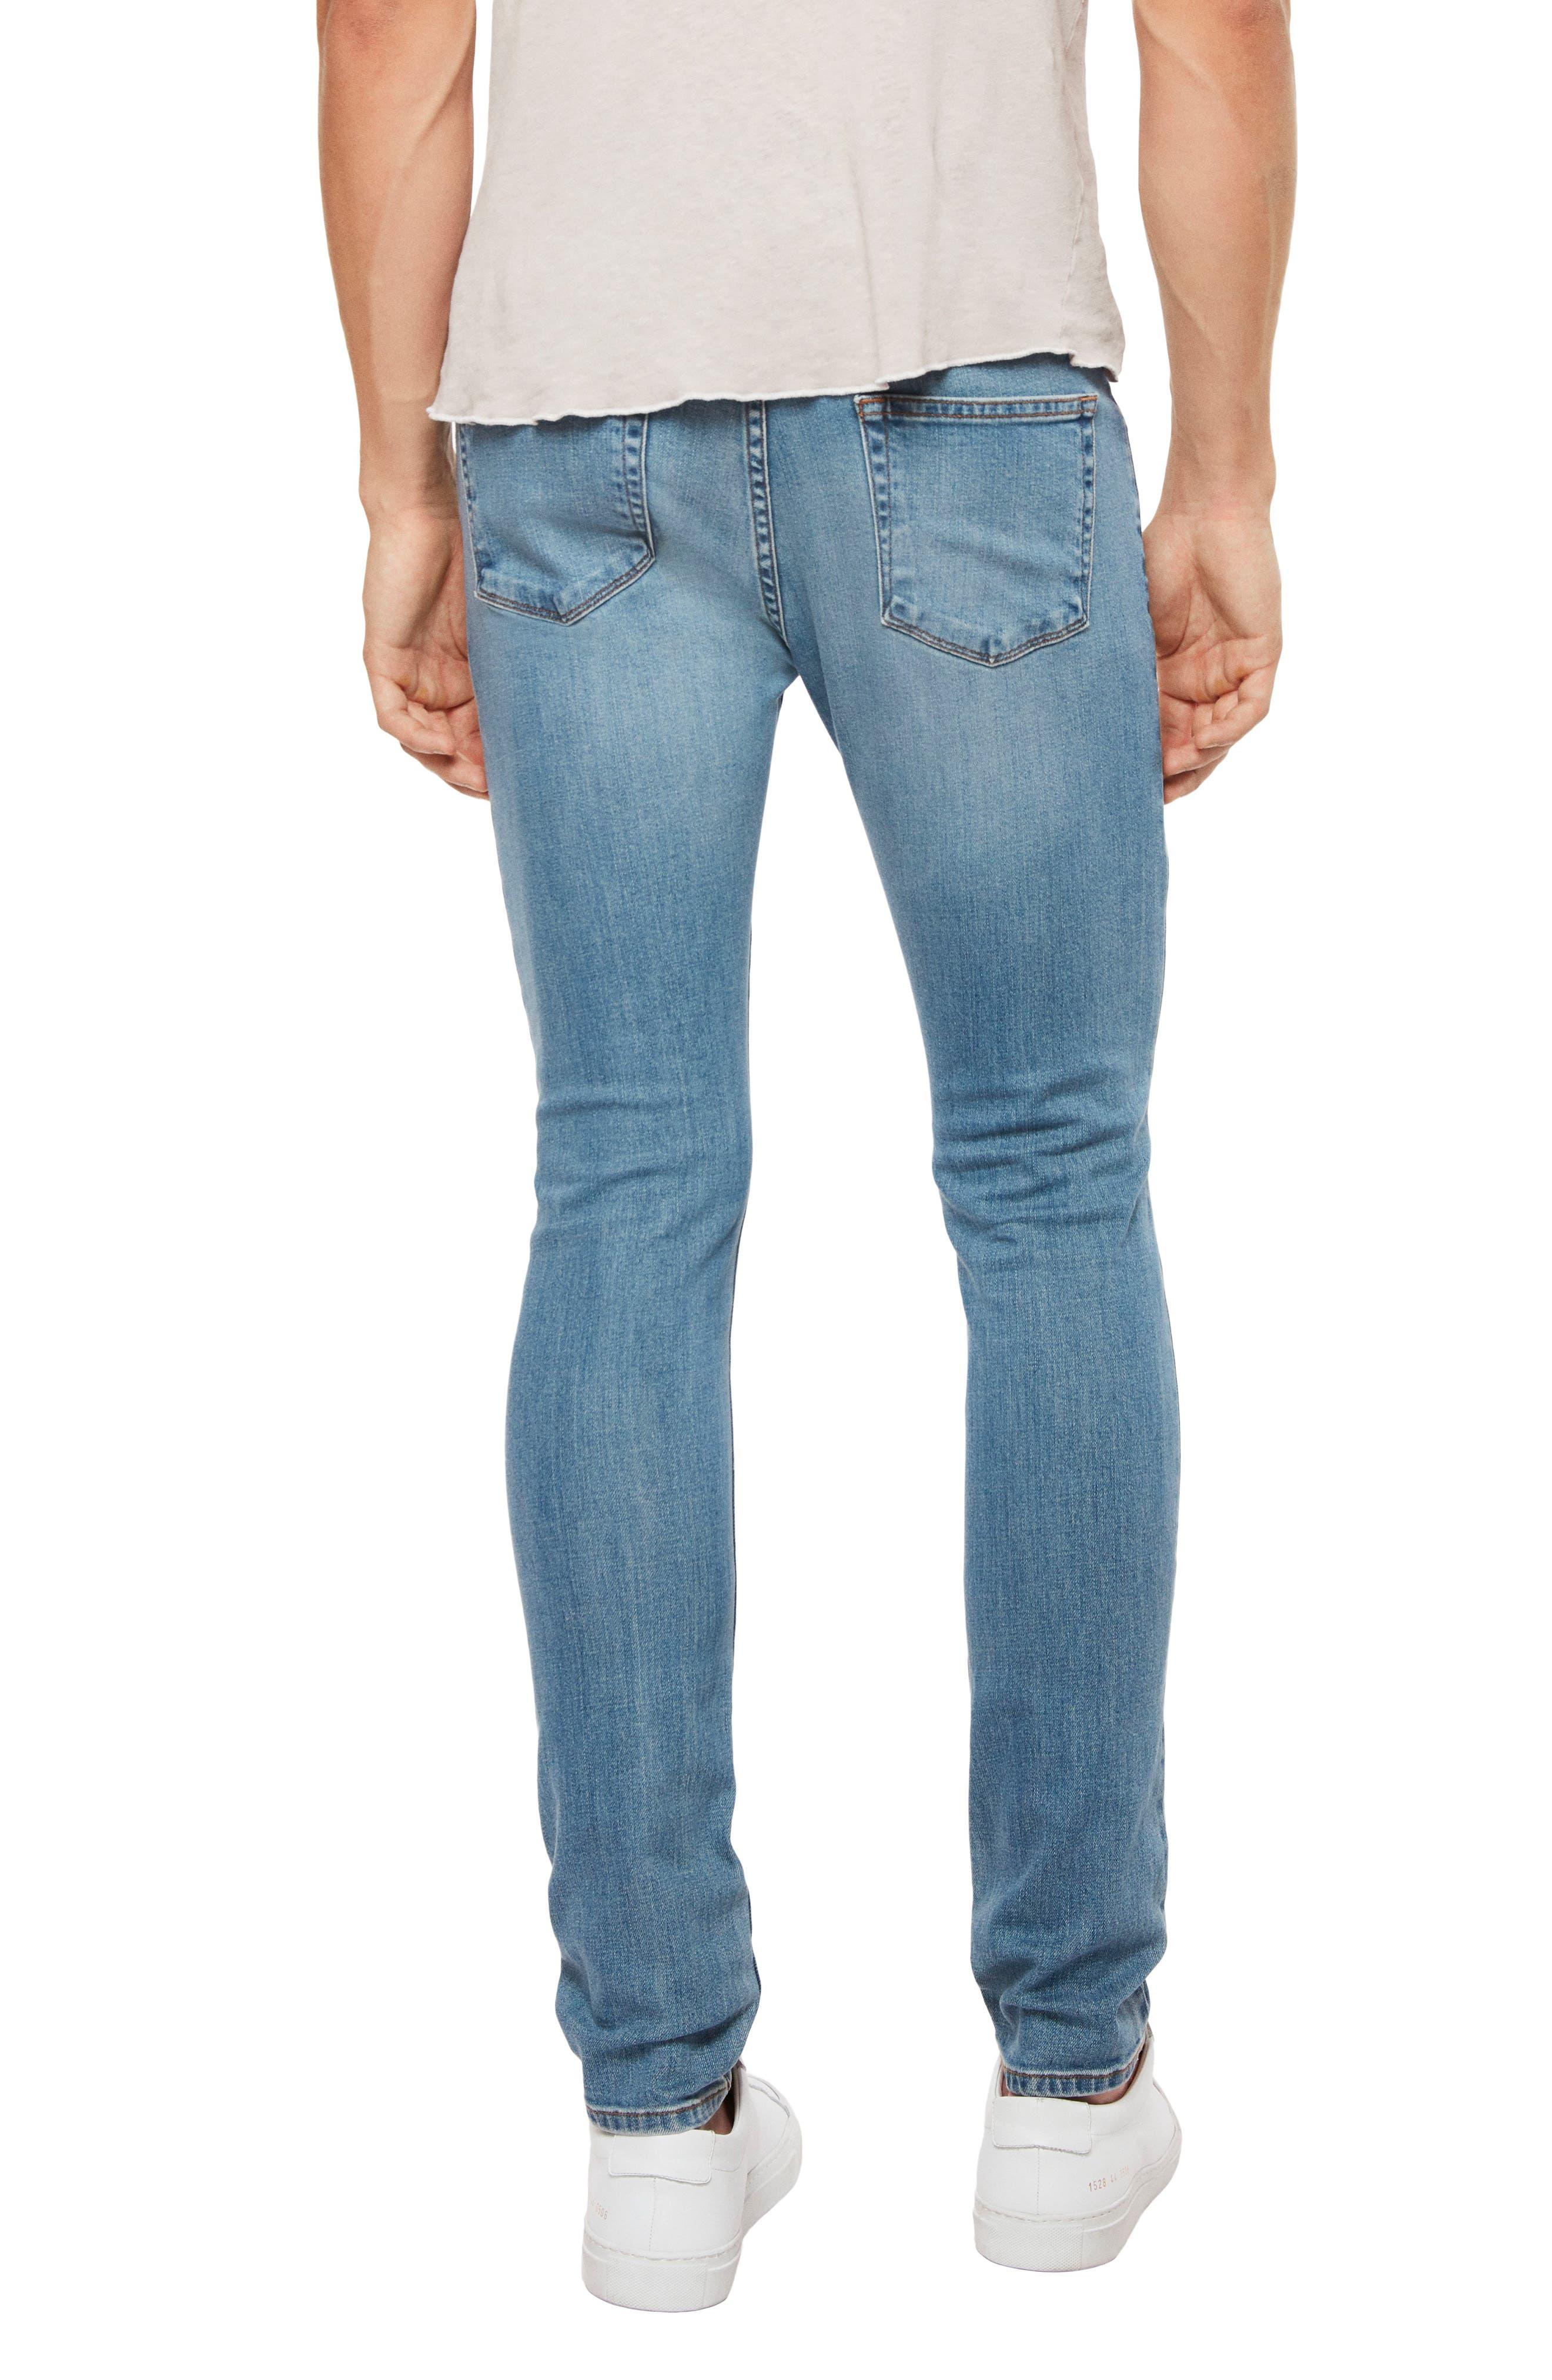 Skinny Fit Jeans,                             Alternate thumbnail 2, color,                             409